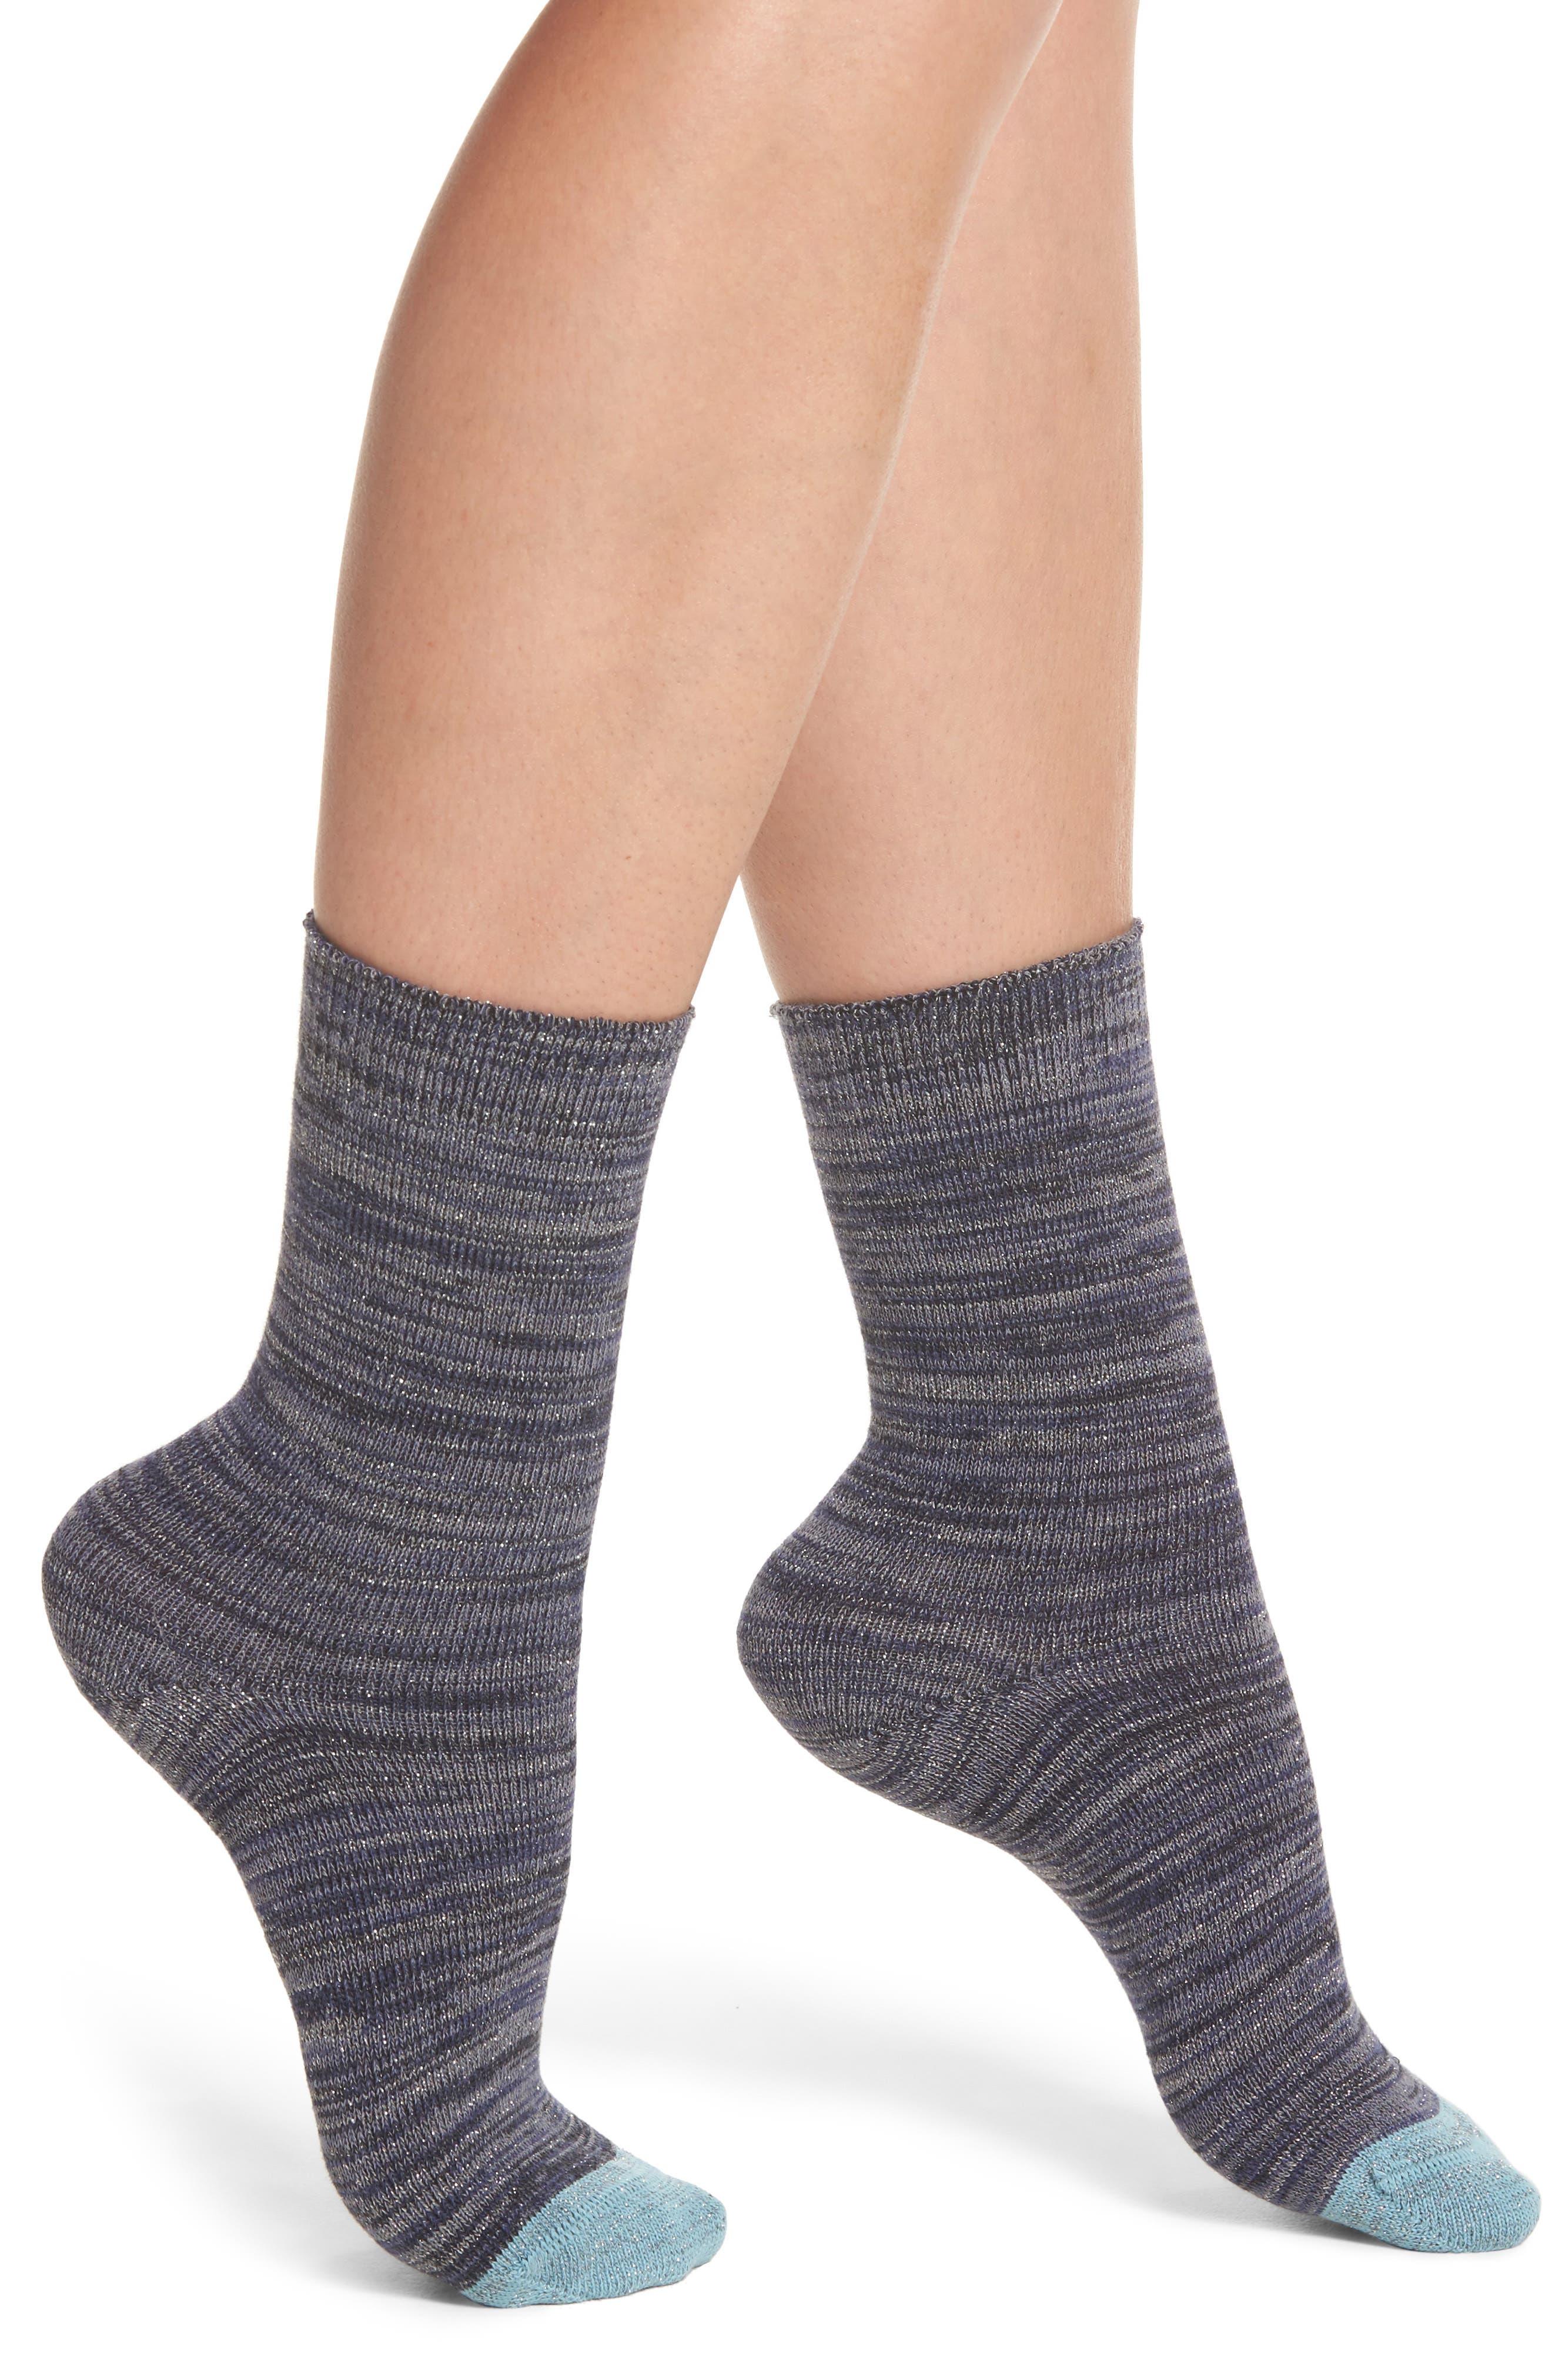 Emily Twinkletoes Crew Socks,                         Main,                         color, Navy